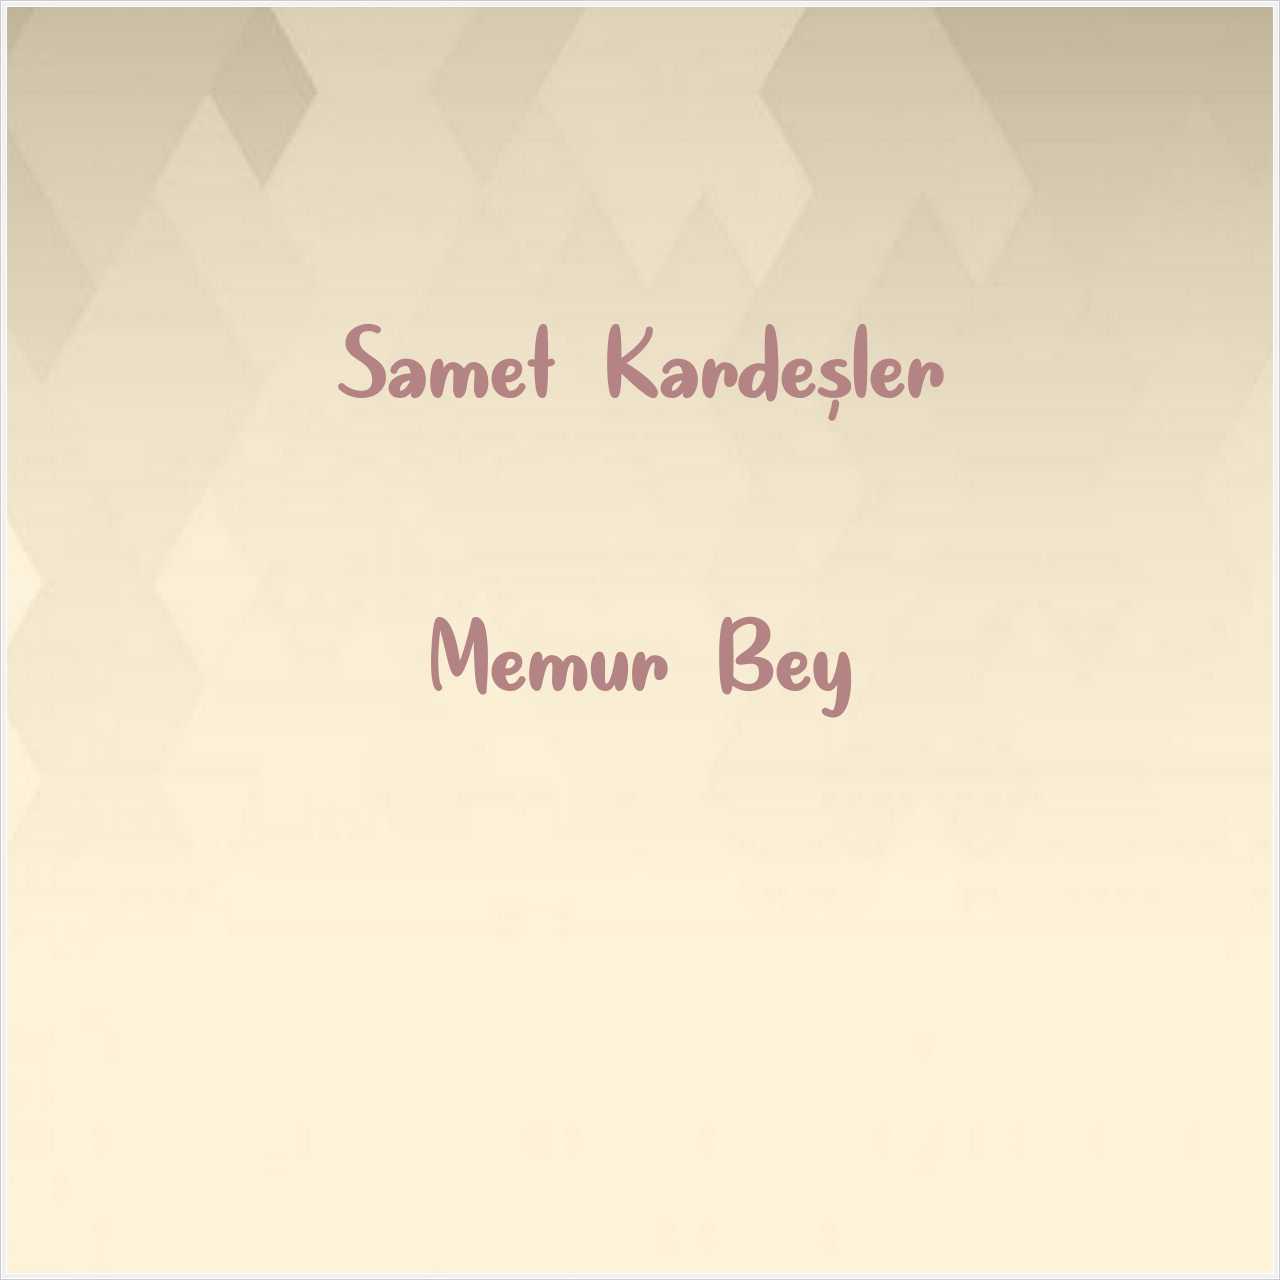 دانلود آهنگ جدید Samet Kardeşler به نام Memur Bey